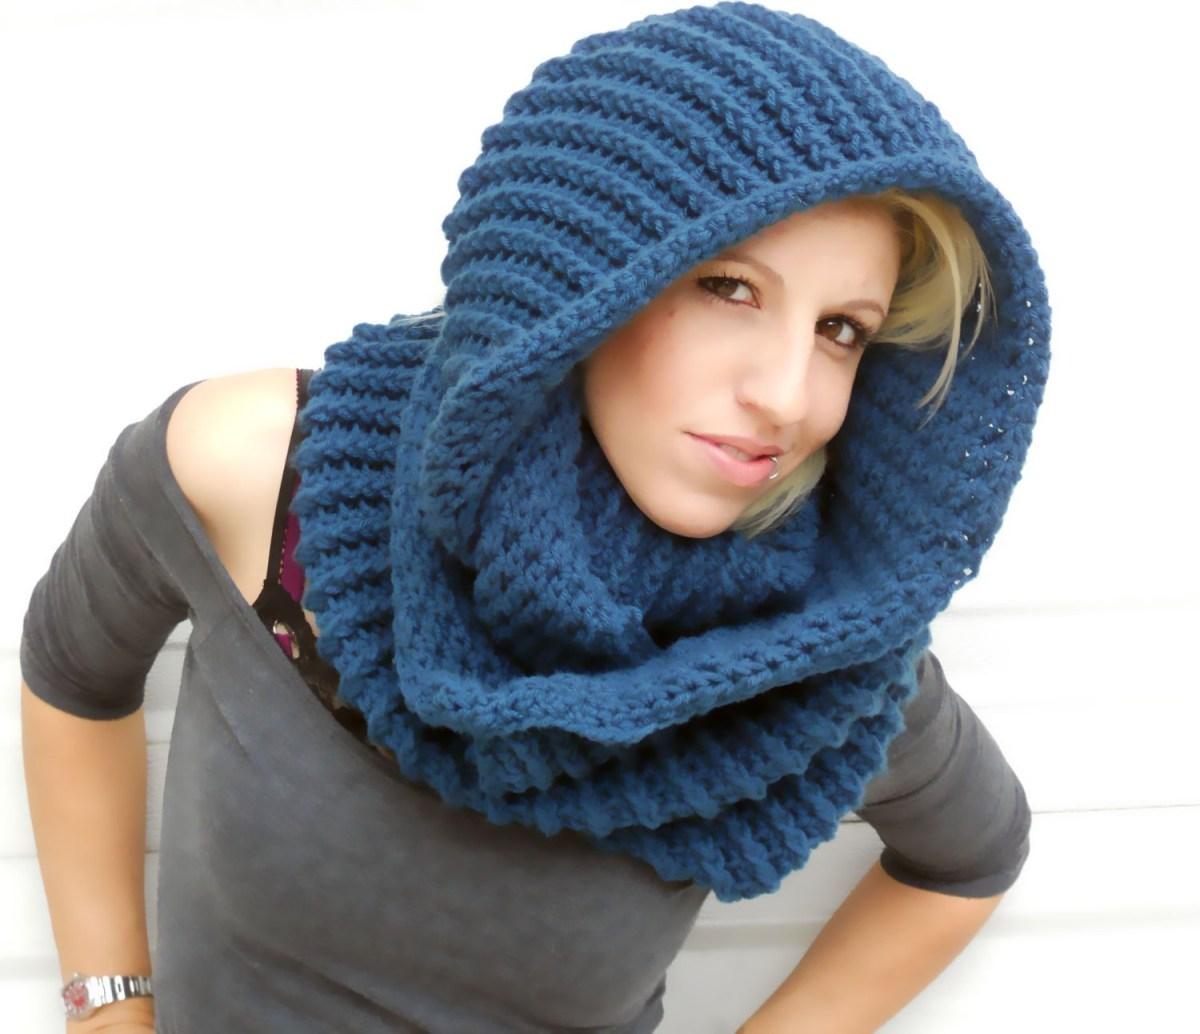 Snood Scarf Crochet Pattern Serenity Blue Cowl Winter Cowl Crochet Cowl Infinity Scarf Etsy